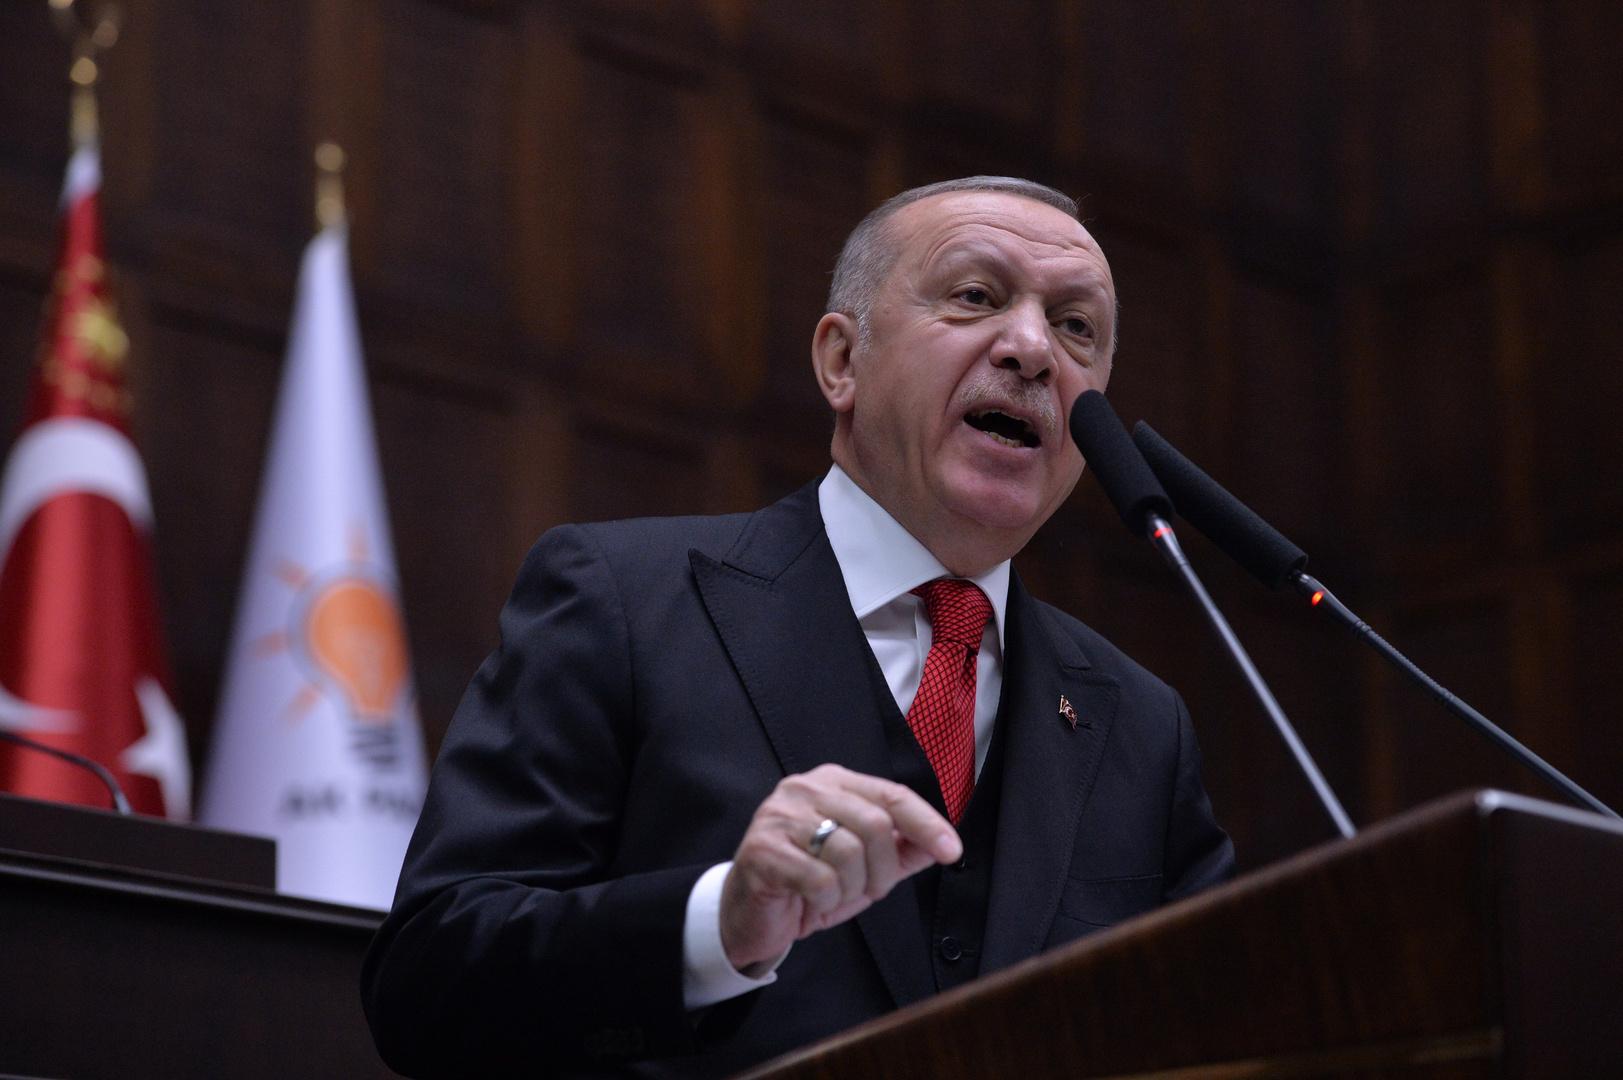 أردوغان، أردوغان، يا لهول أردوغان!